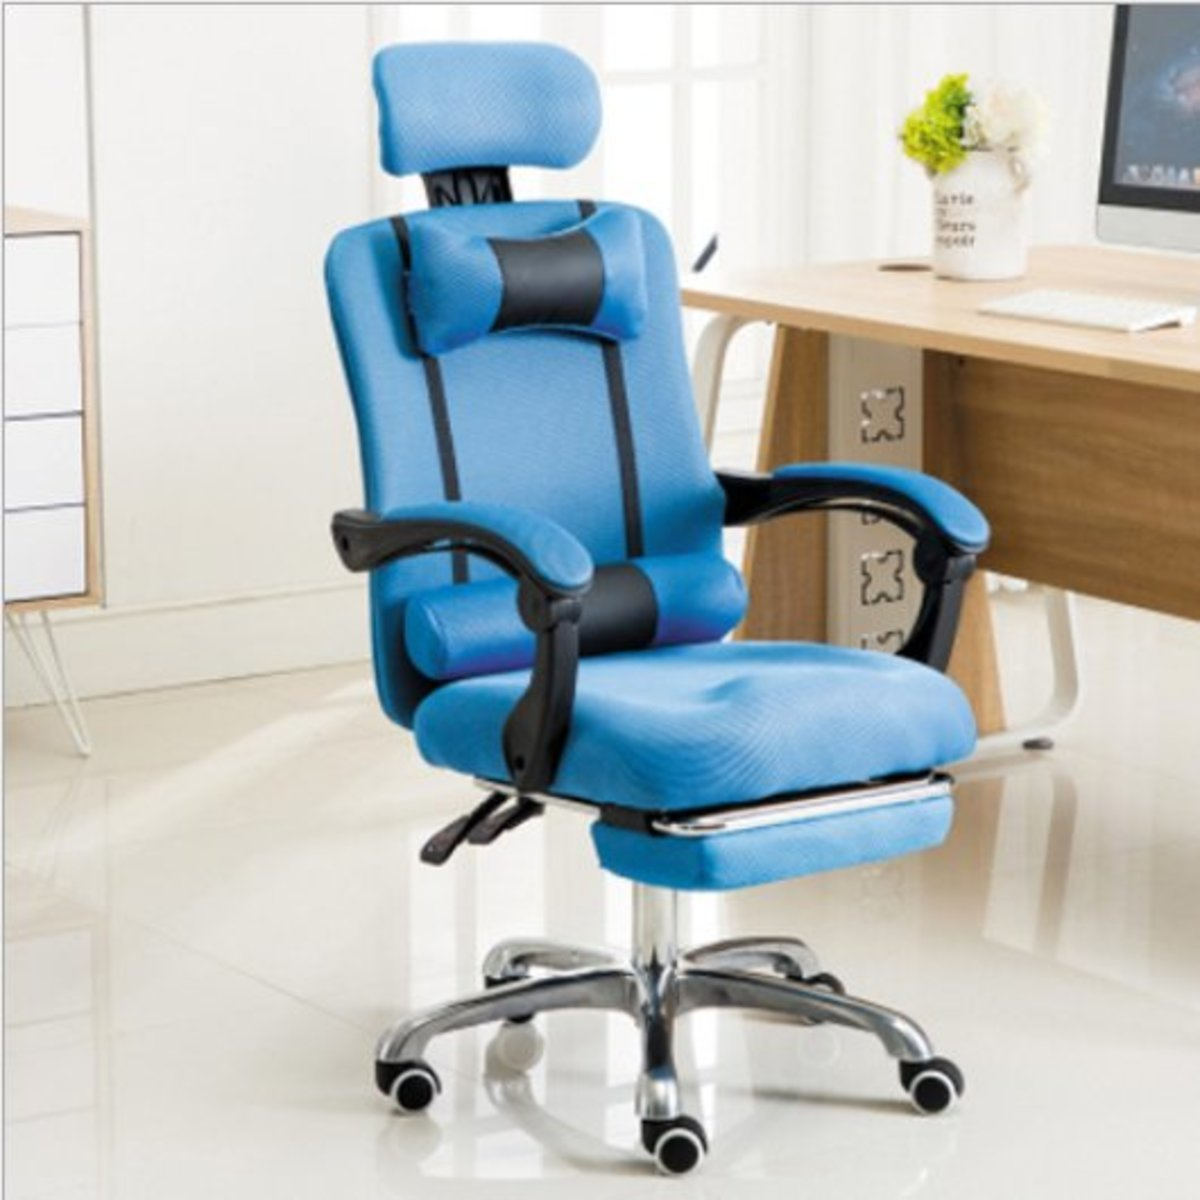 Ergonomic Liftable Computer Office Chair - Blue